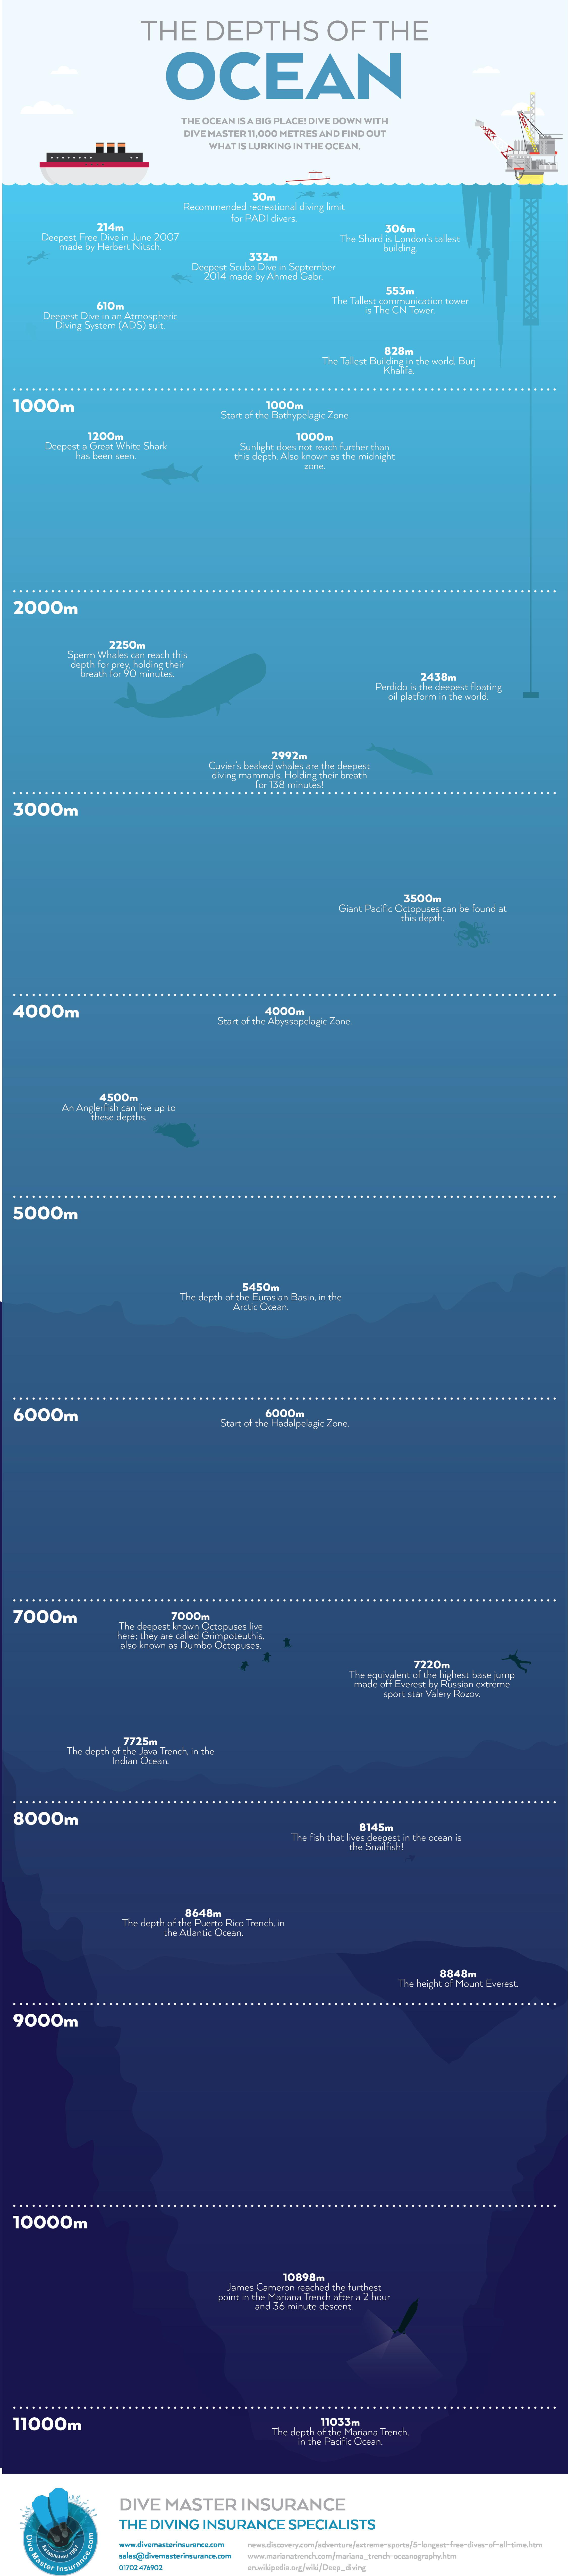 Dive Master – Depths of the Ocean